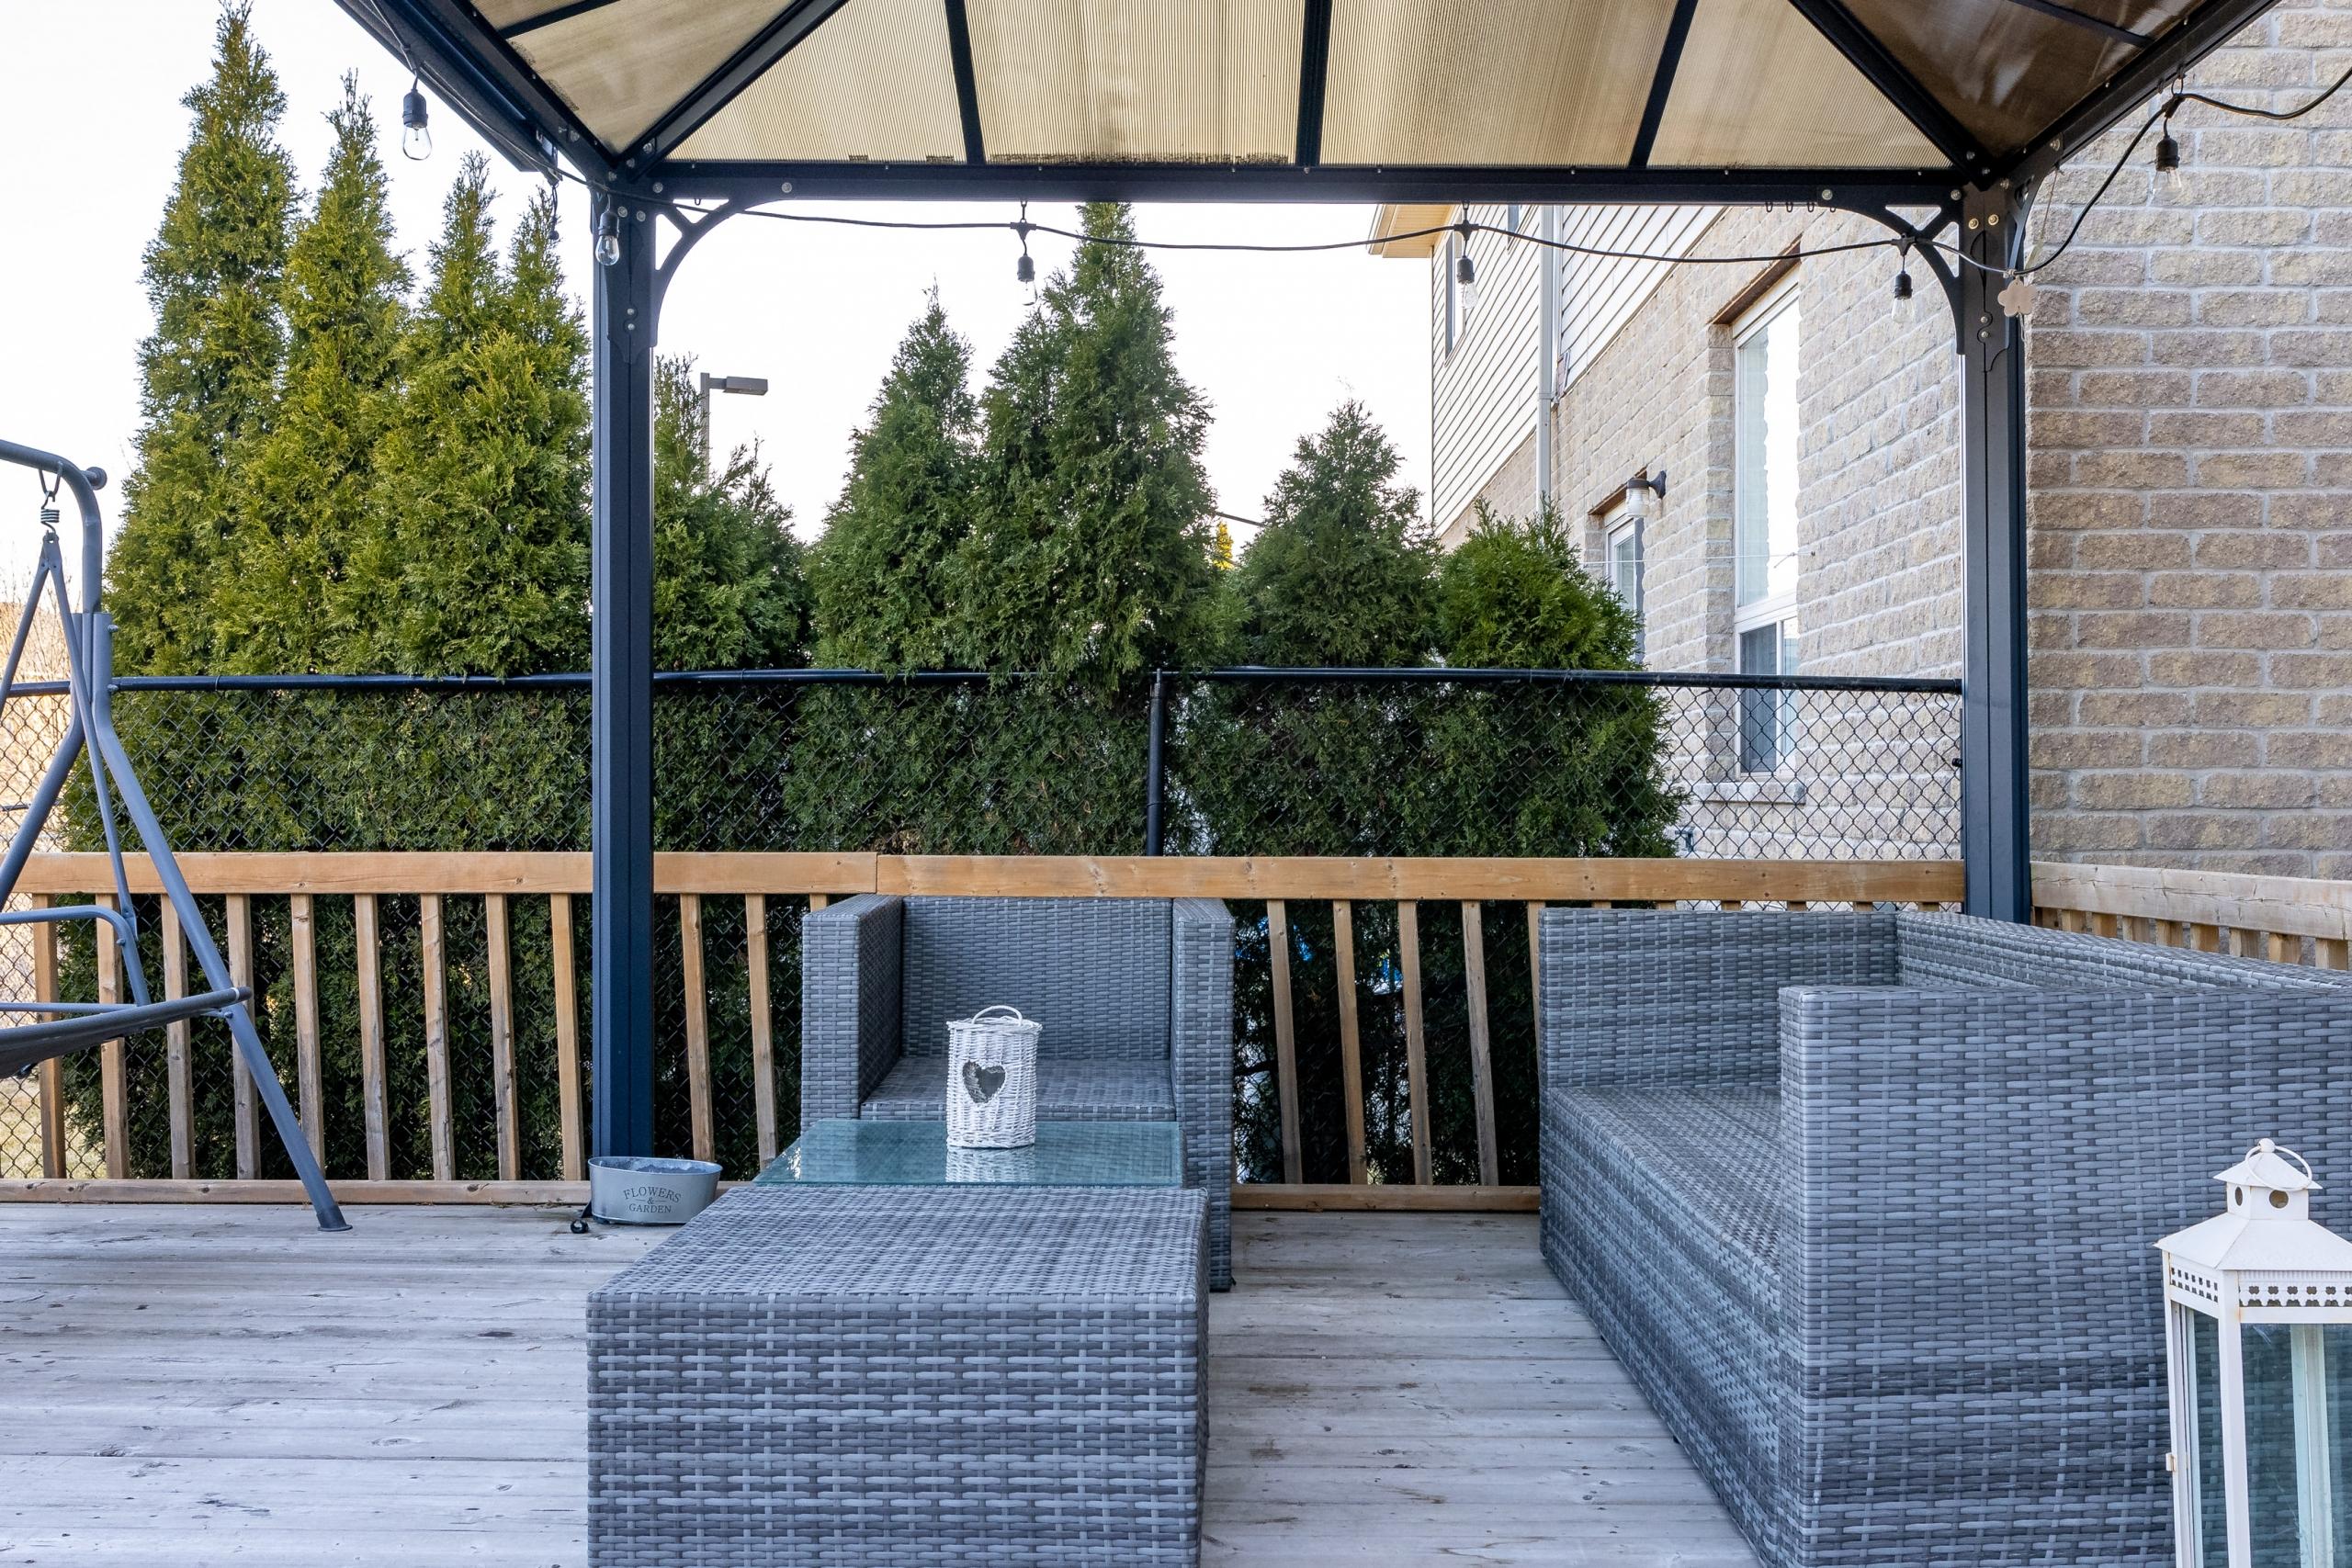 Patio featured at 5321 Scotia Street, Burlington at Alex Irish & Associates